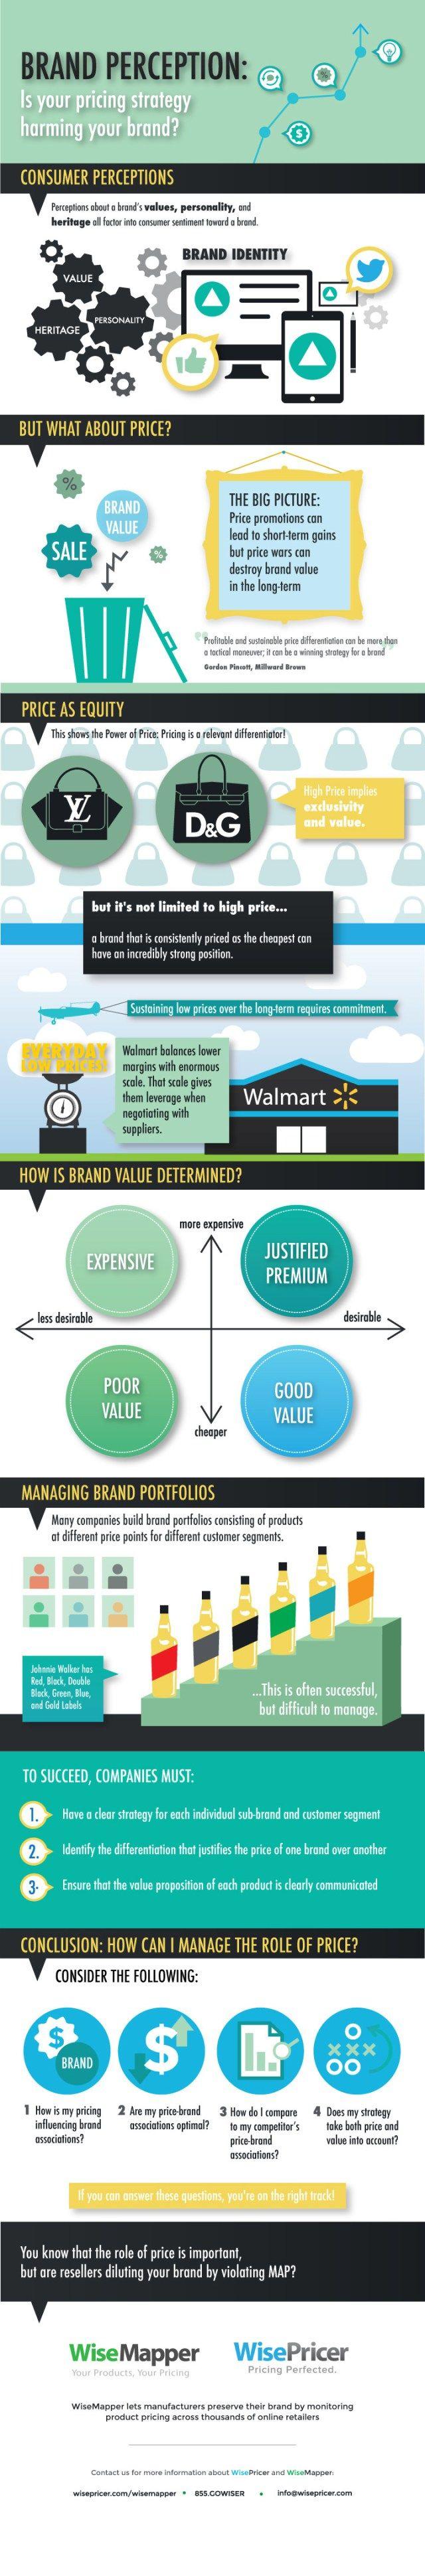 Brand perception #infografia #infographic #marketing